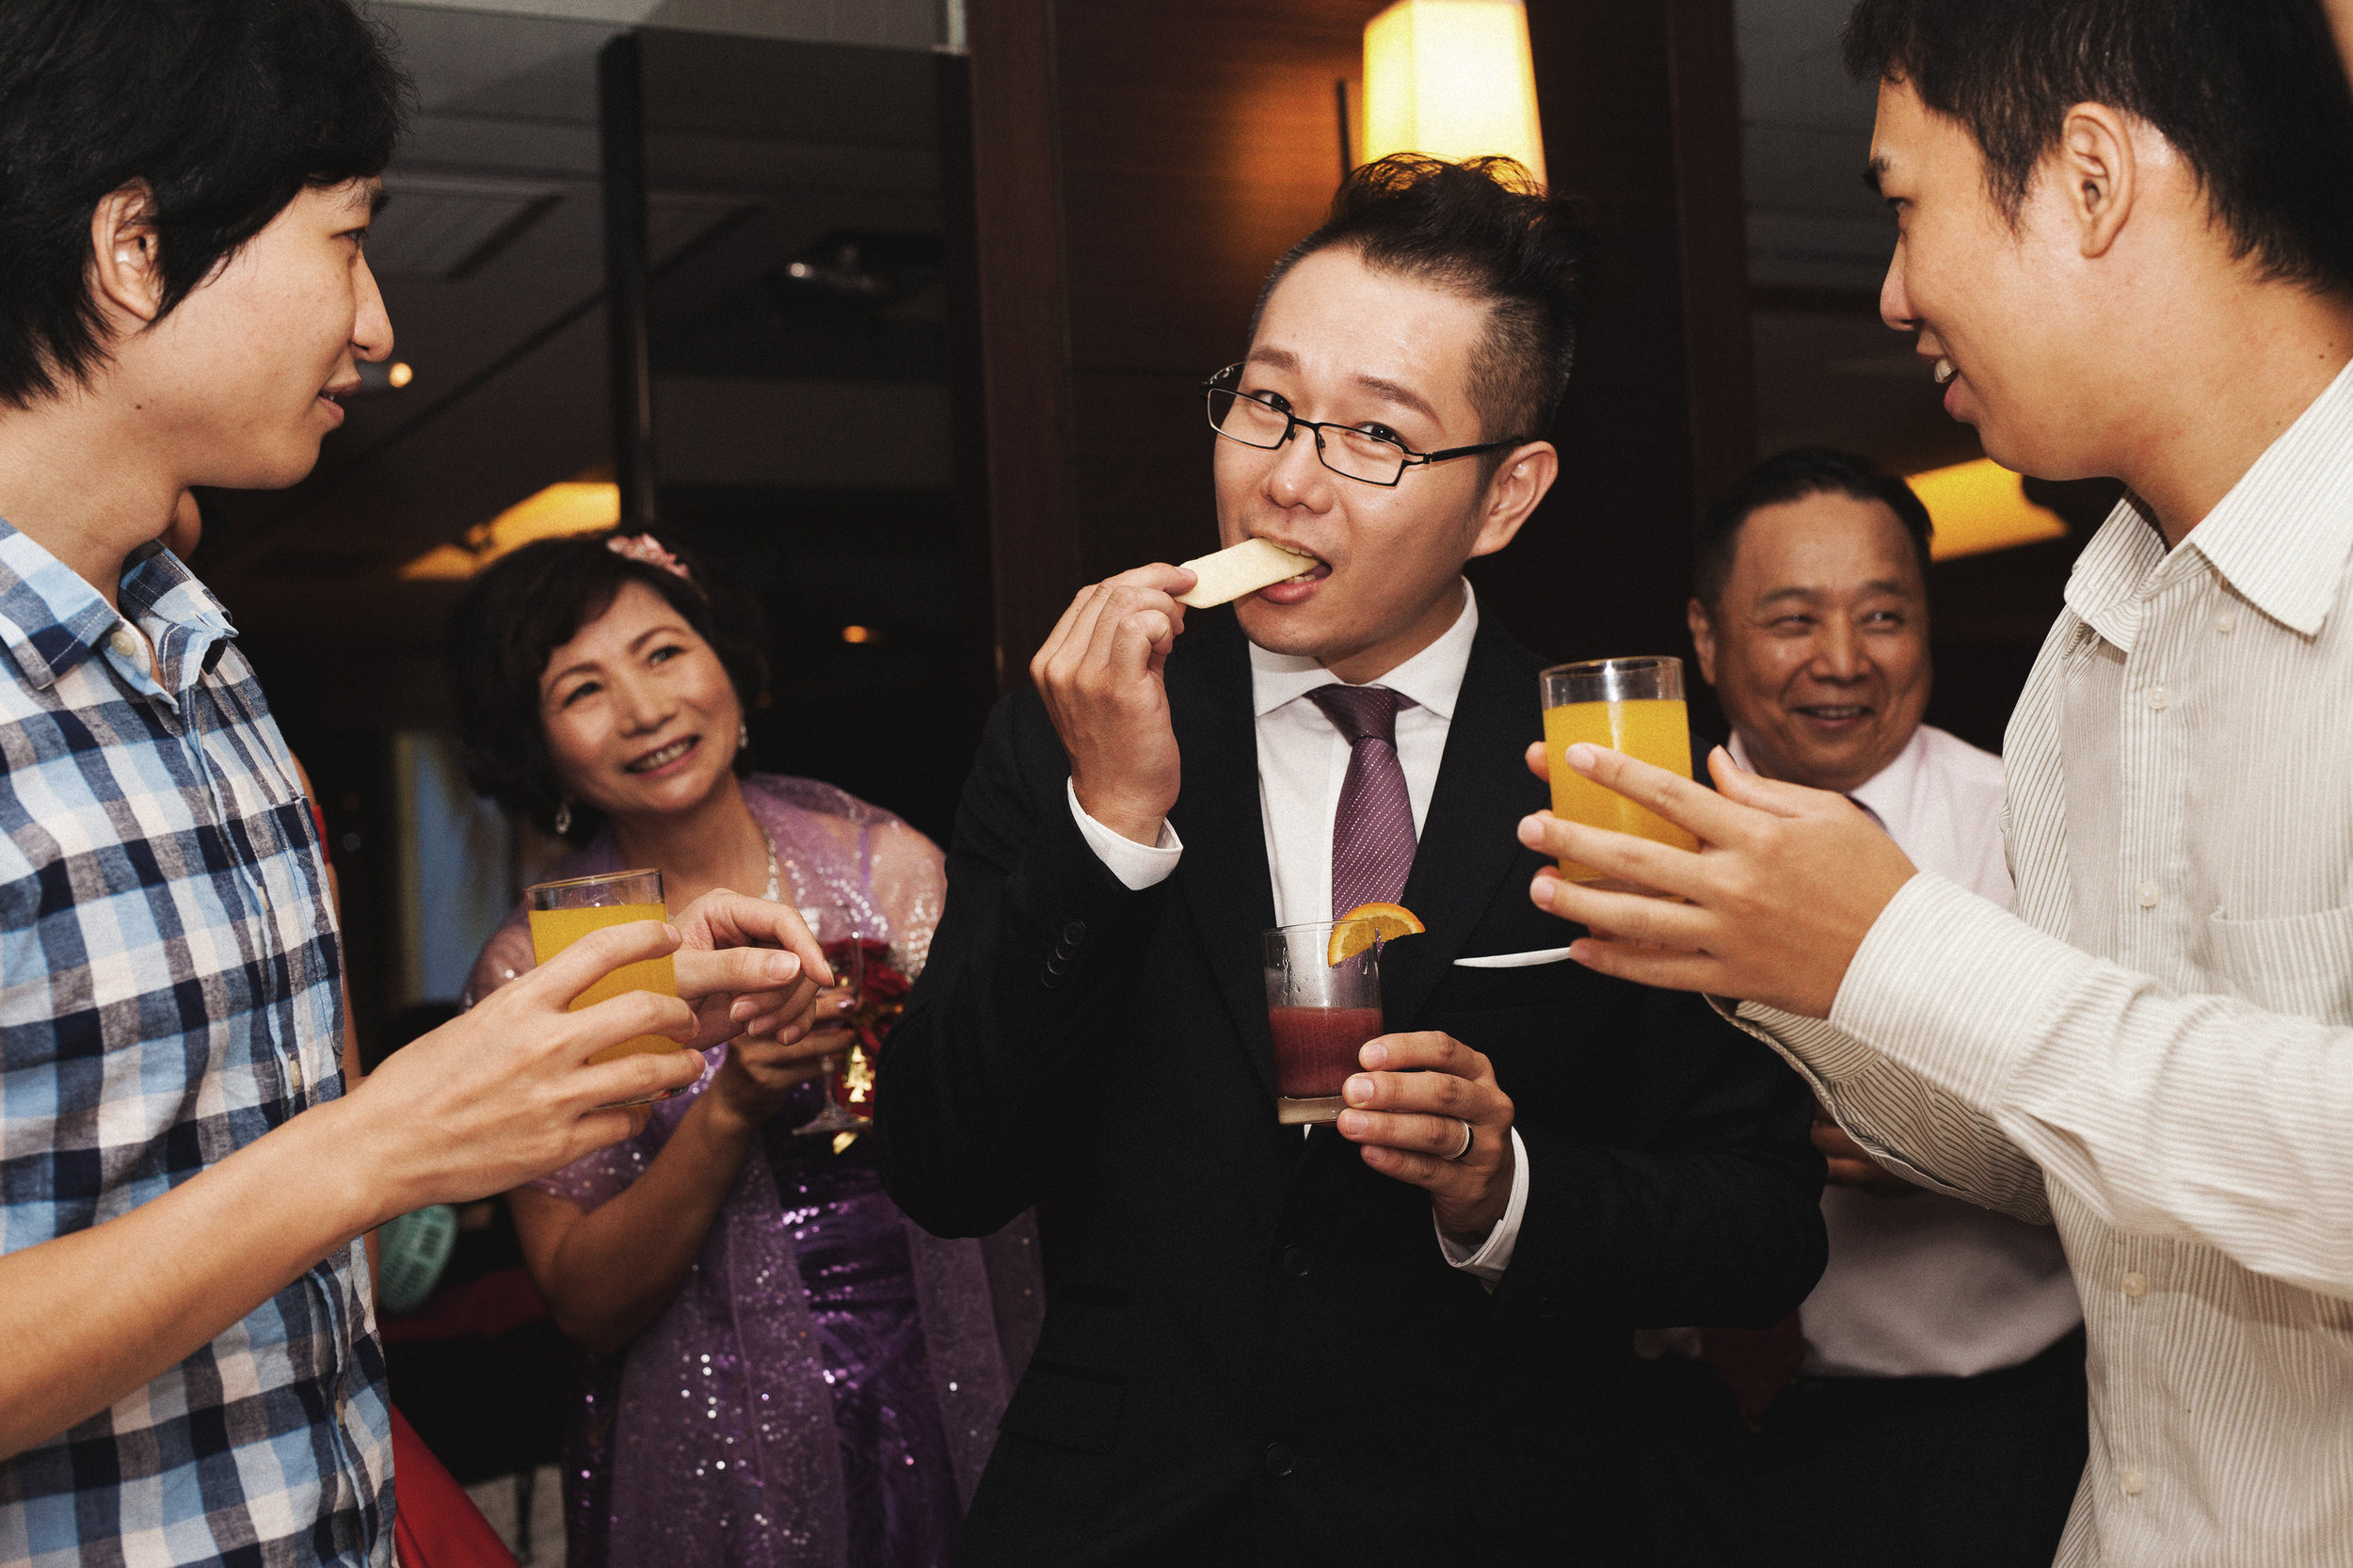 [JC]CREATIVE 女性攝影師 北投儷宴會館 補請台灣WEDDING    自然風格 台北婚攝推 女婚攝  桃園婚攝   圖像00348.JPG